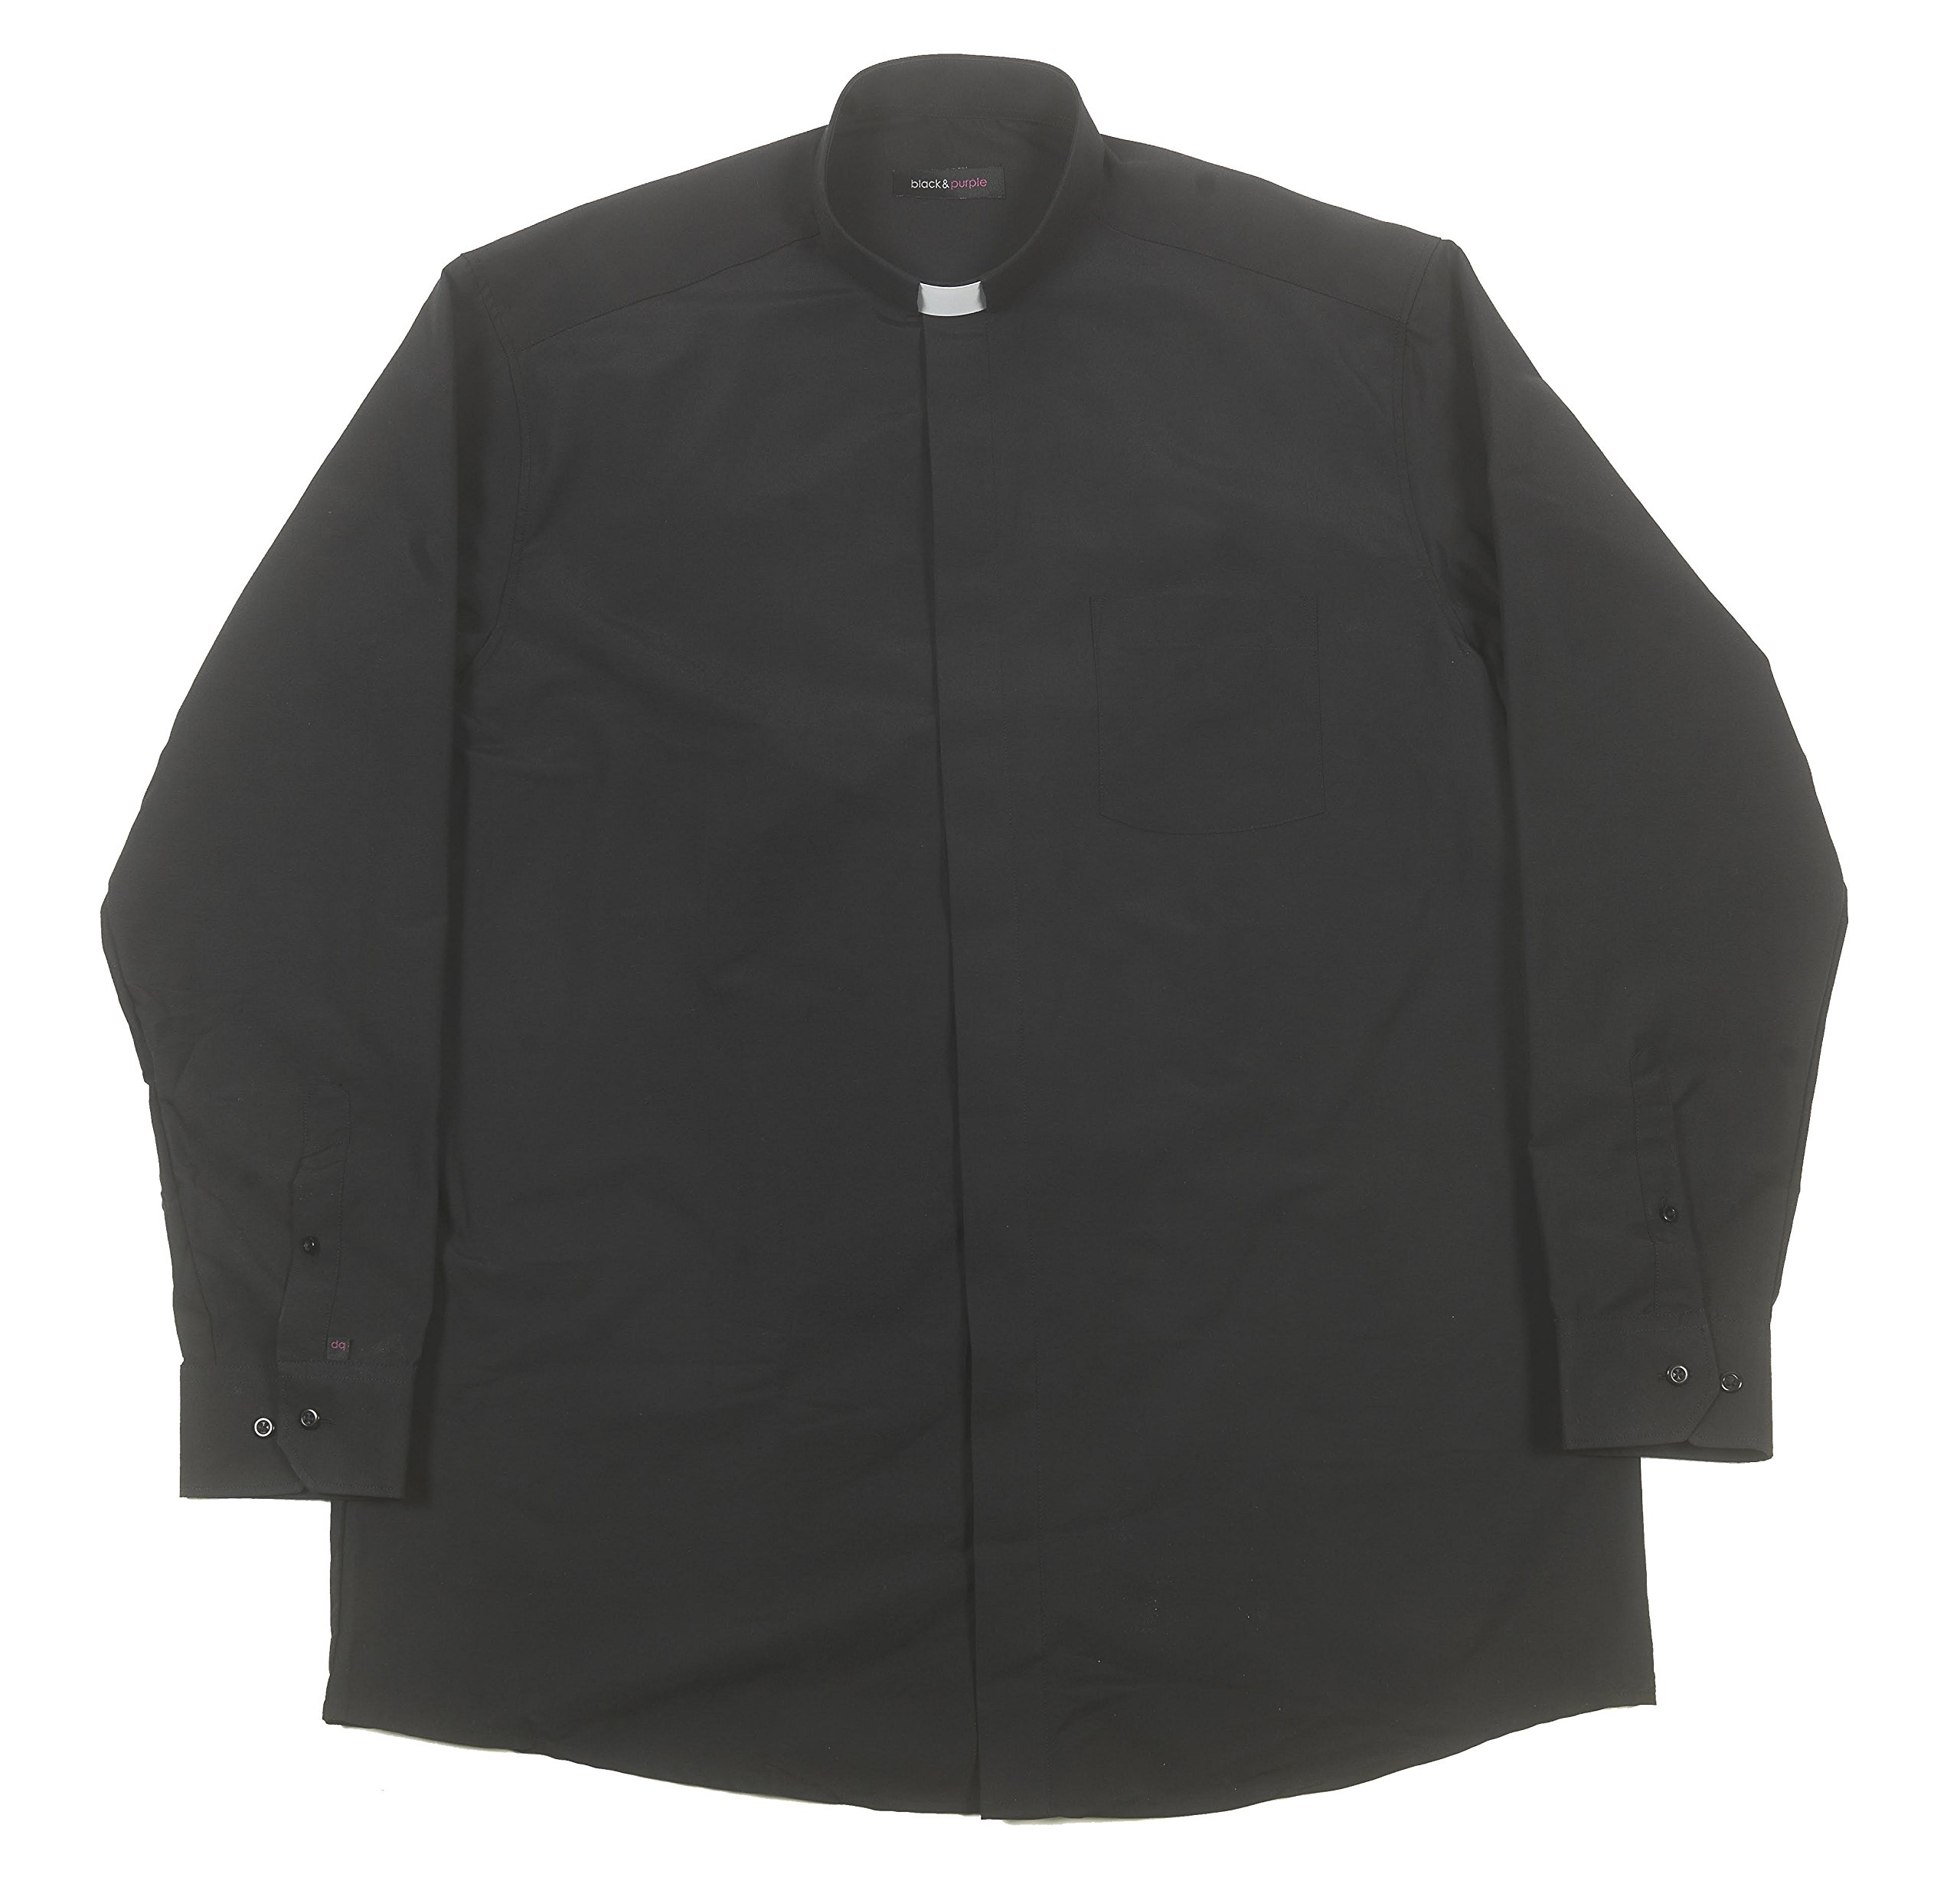 Liturgical Creations Mens Long Sleeve Single Pocket Clergy Shirt, 100% Cotton